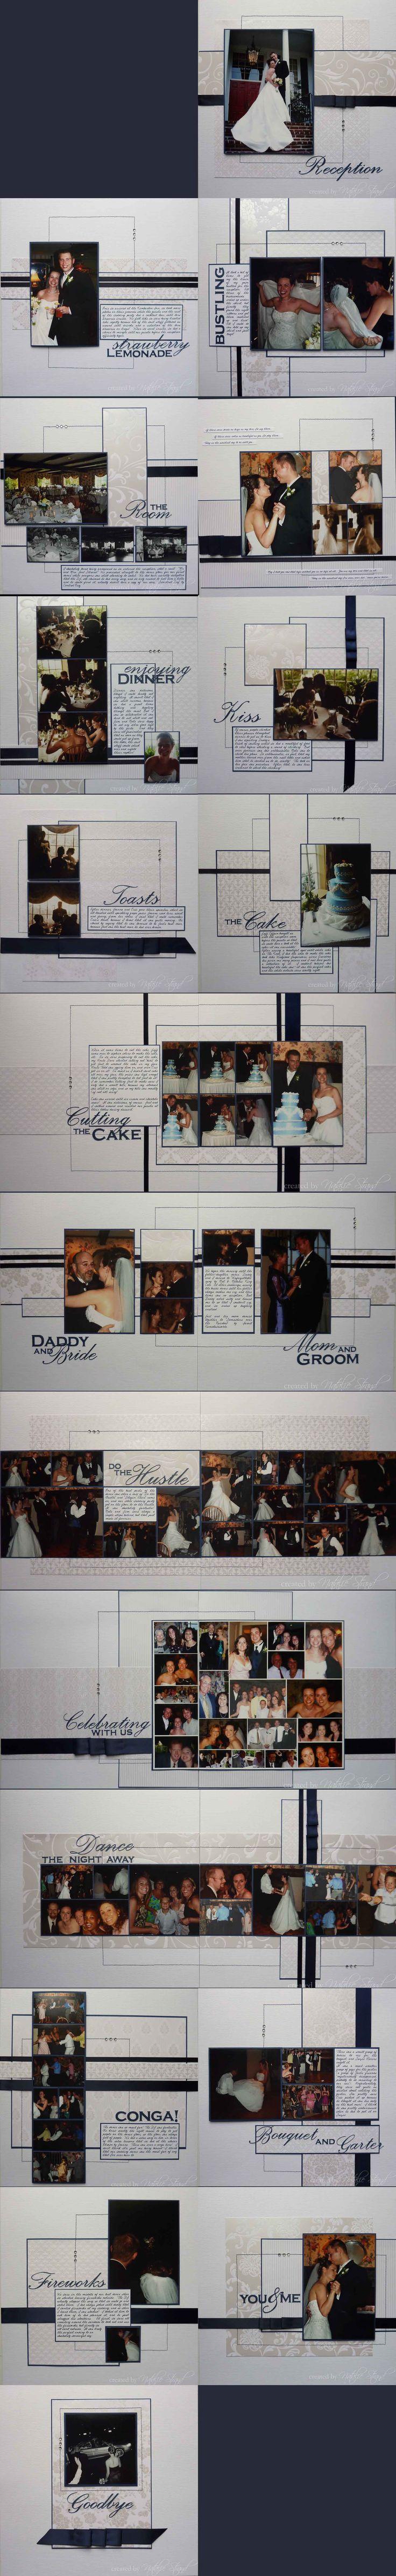 How to scrapbook wedding album - Wedding Scrapbook Album Ceremony Reception